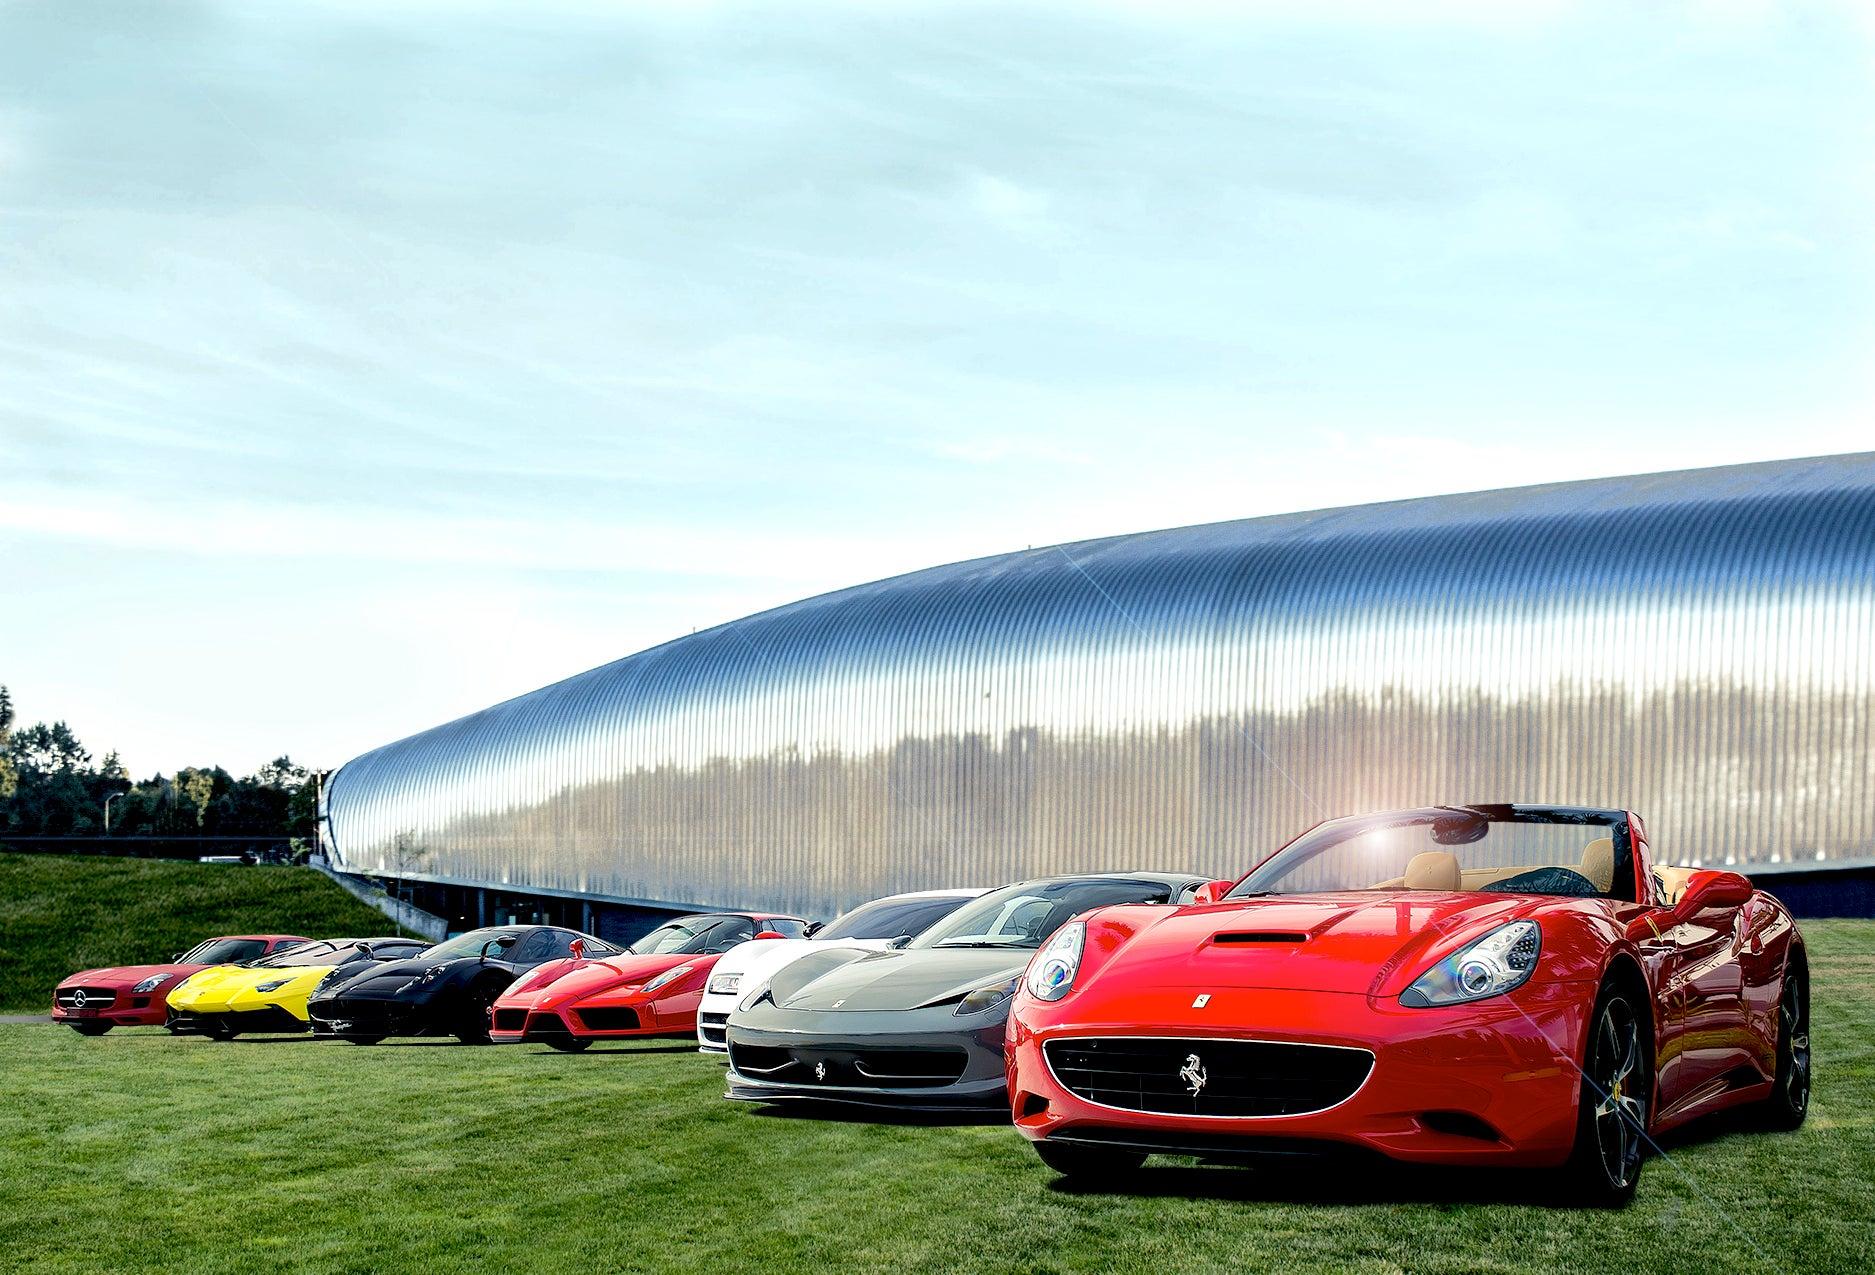 Exotic Meet Acm America S Car Museum